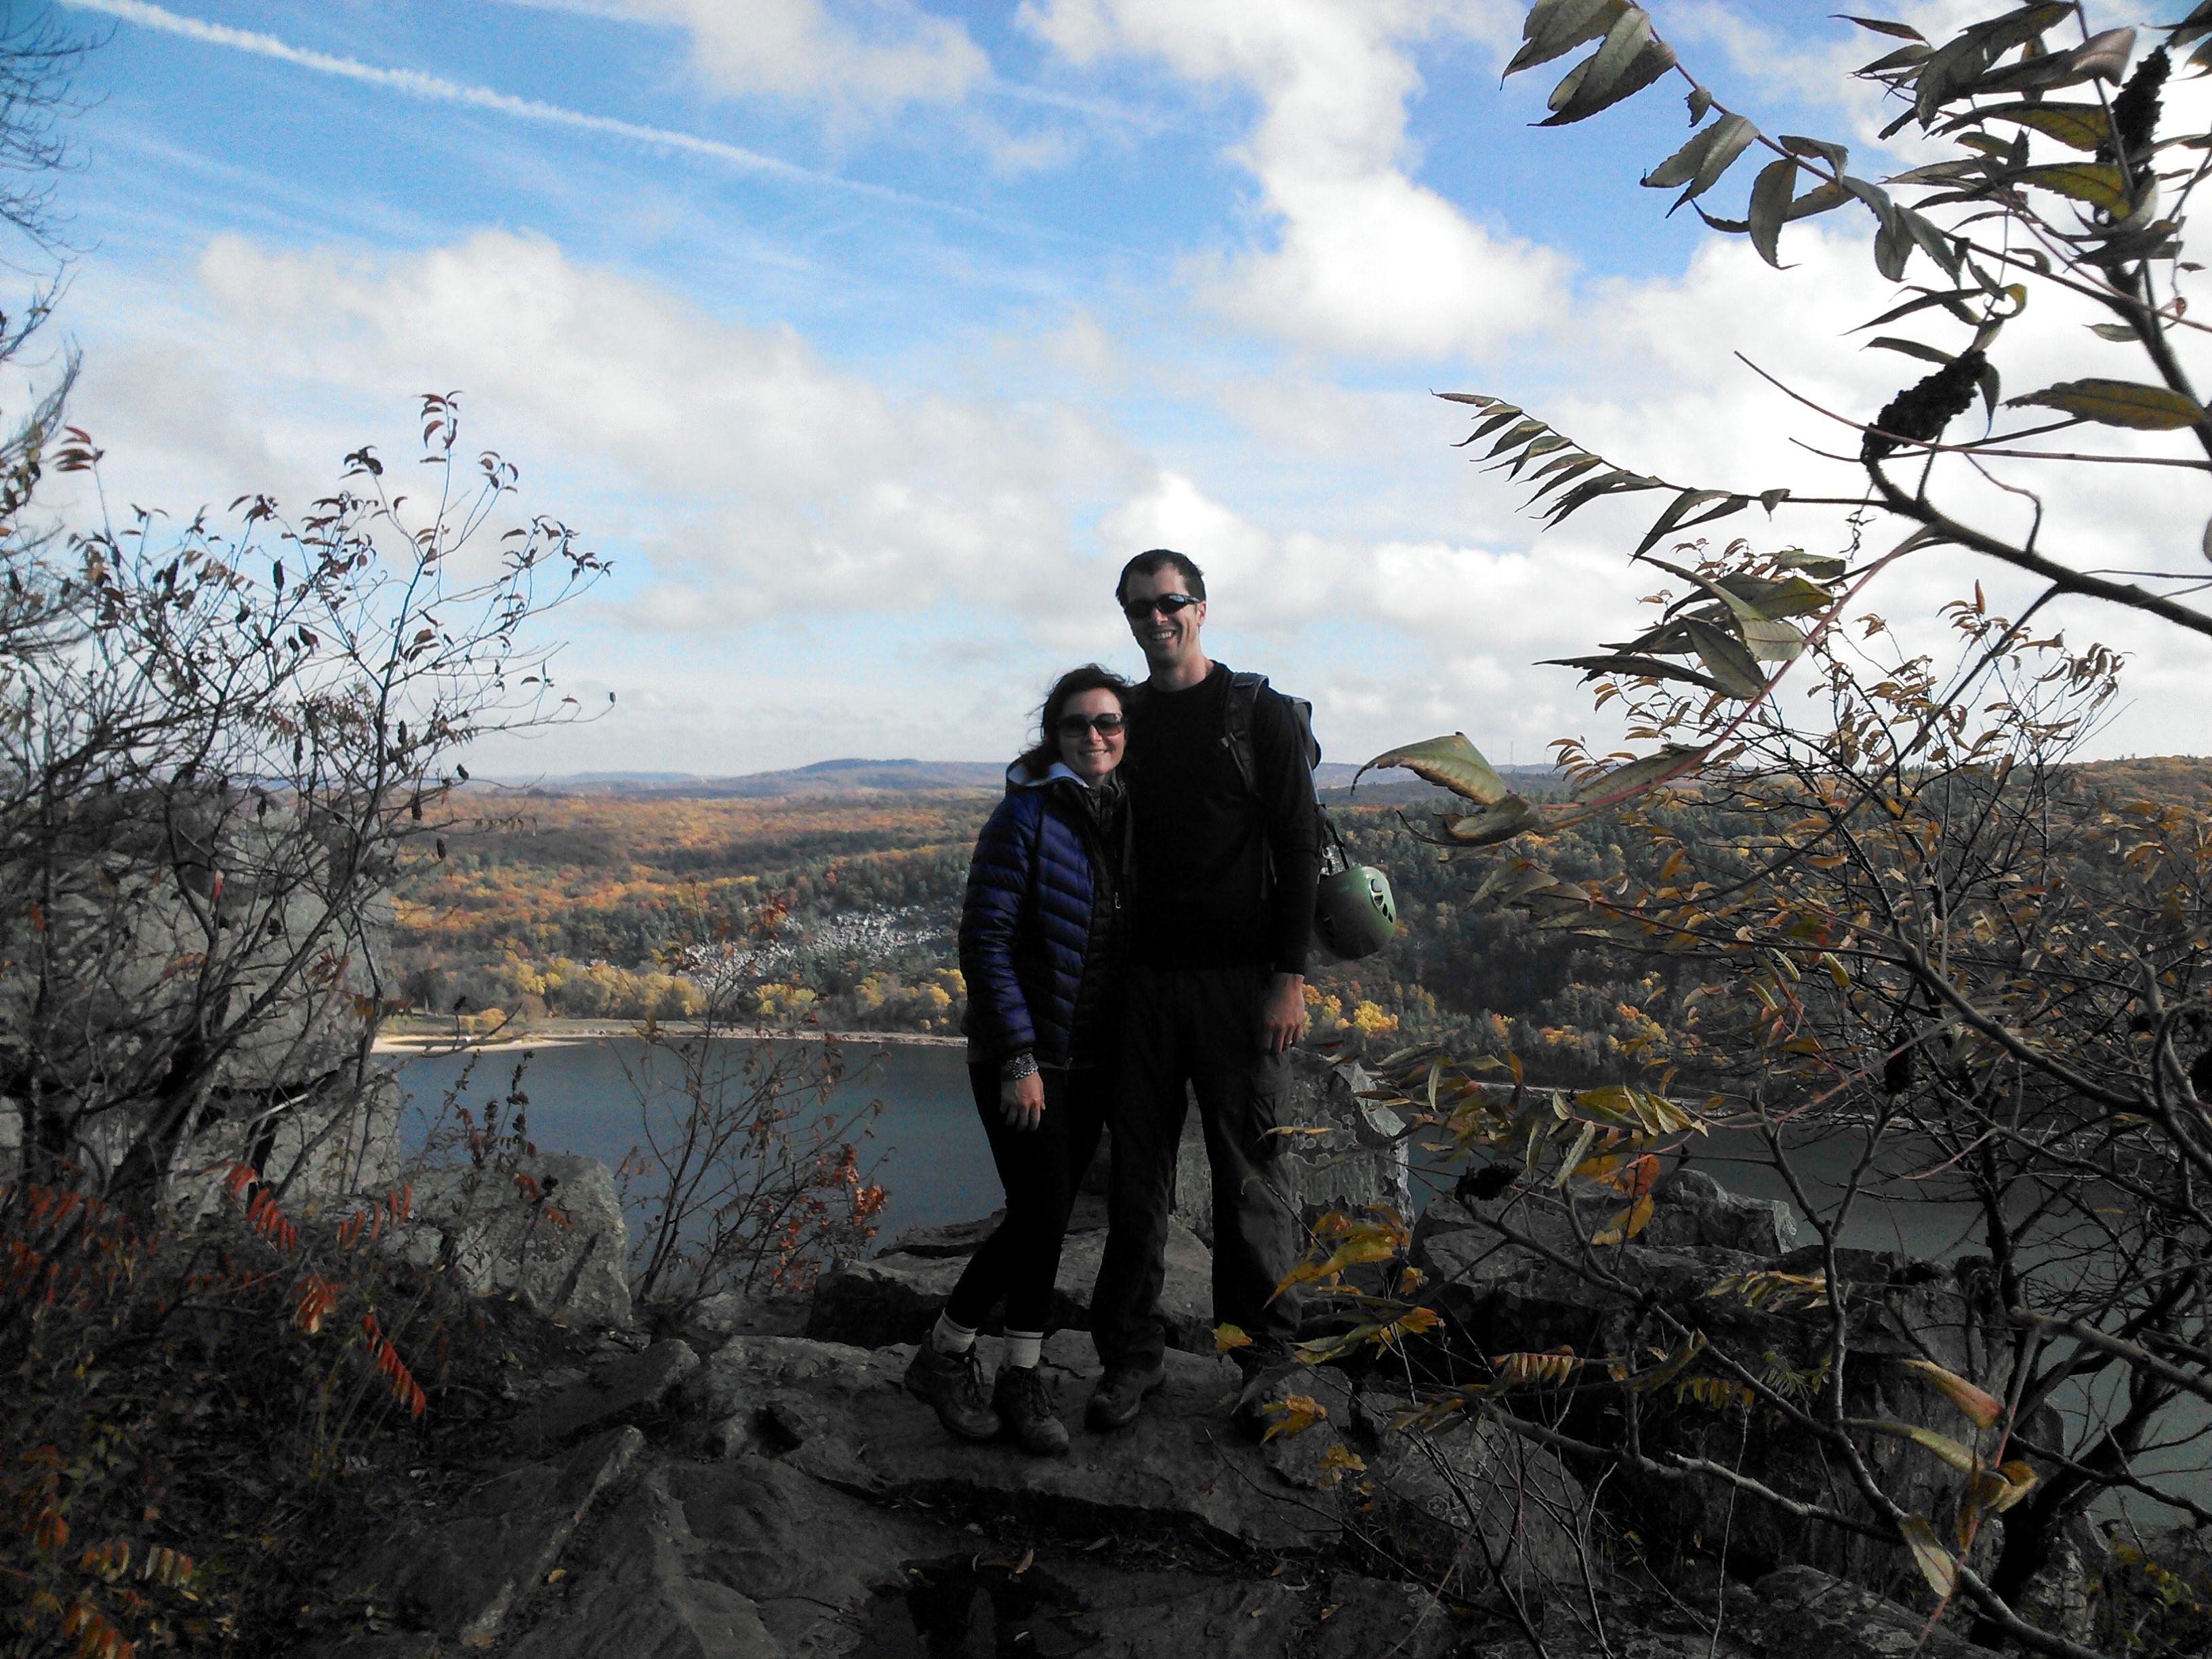 Devil's Lake rock climbing, , Wisconsin in the fall